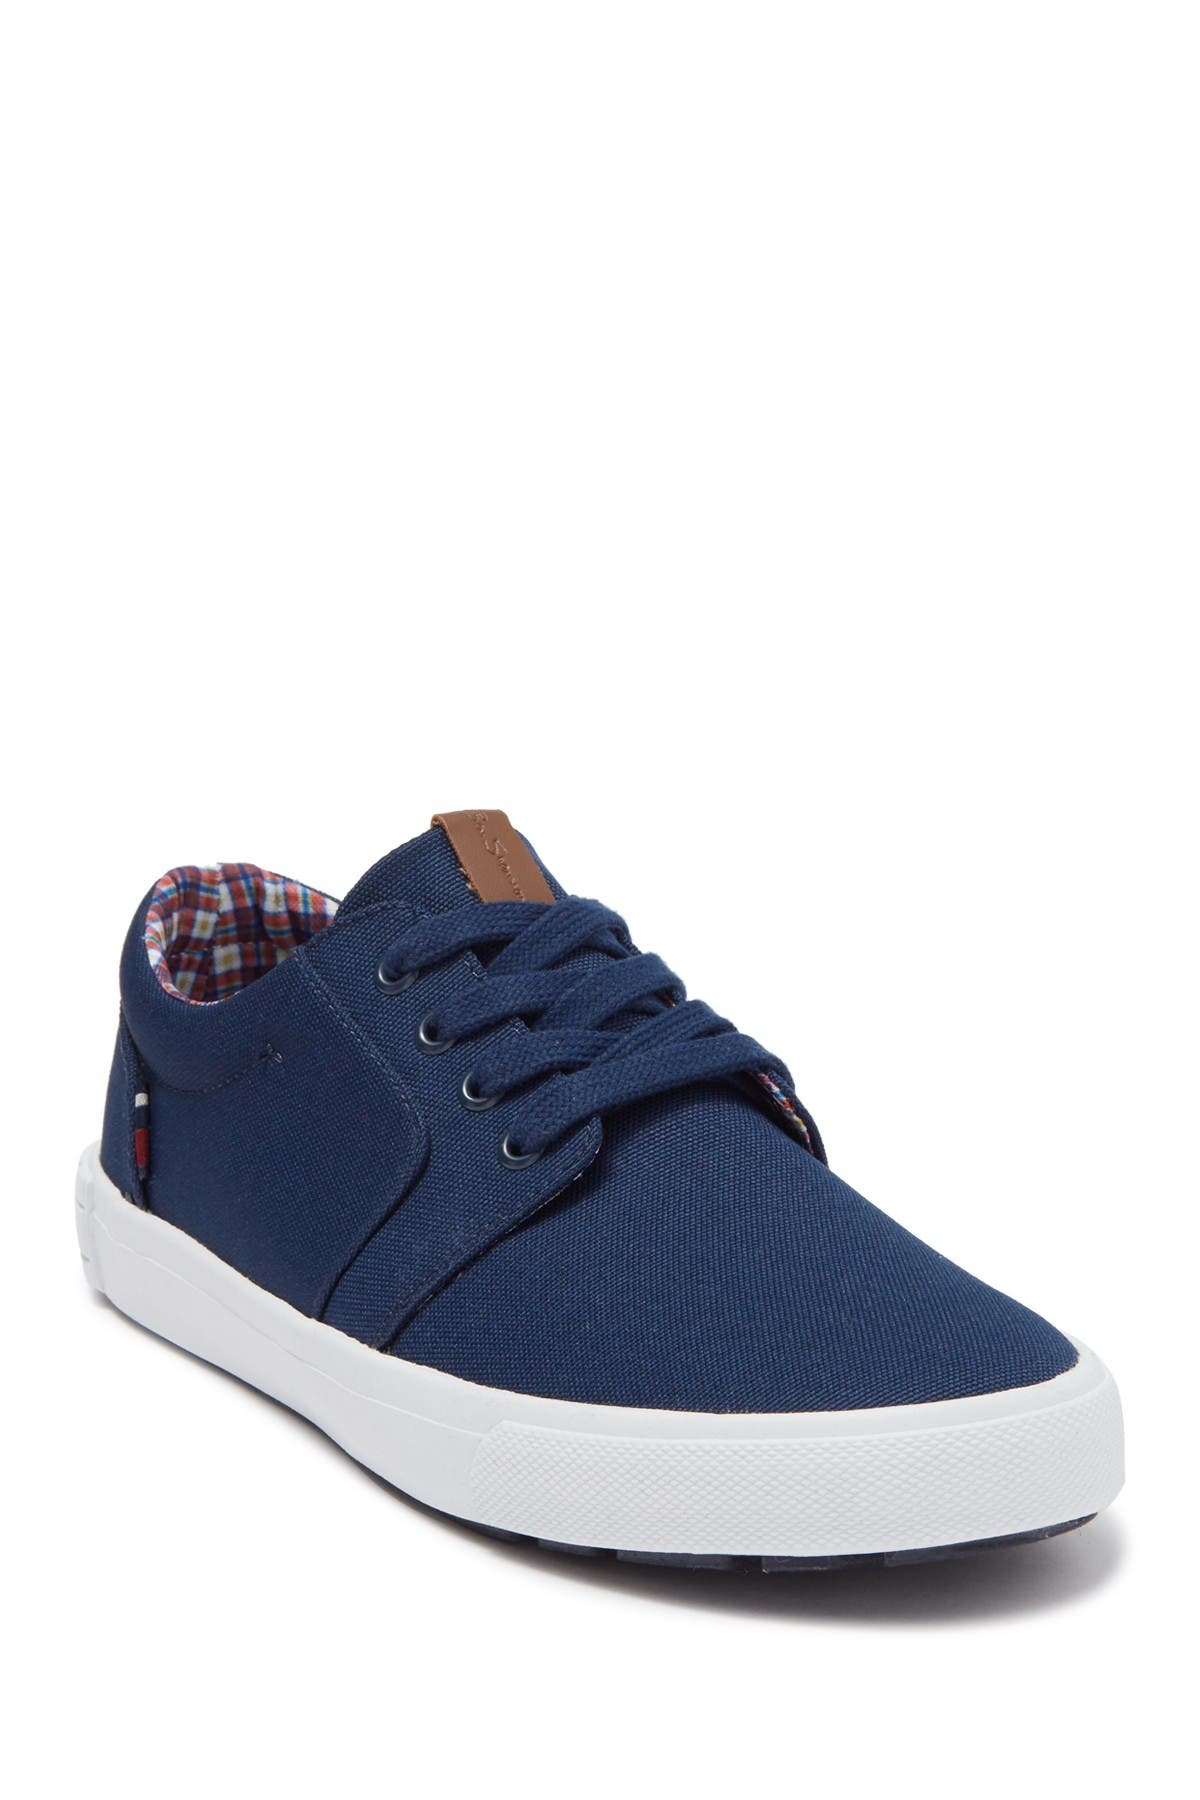 Image of Ben Sherman Percy Oxford Sneaker